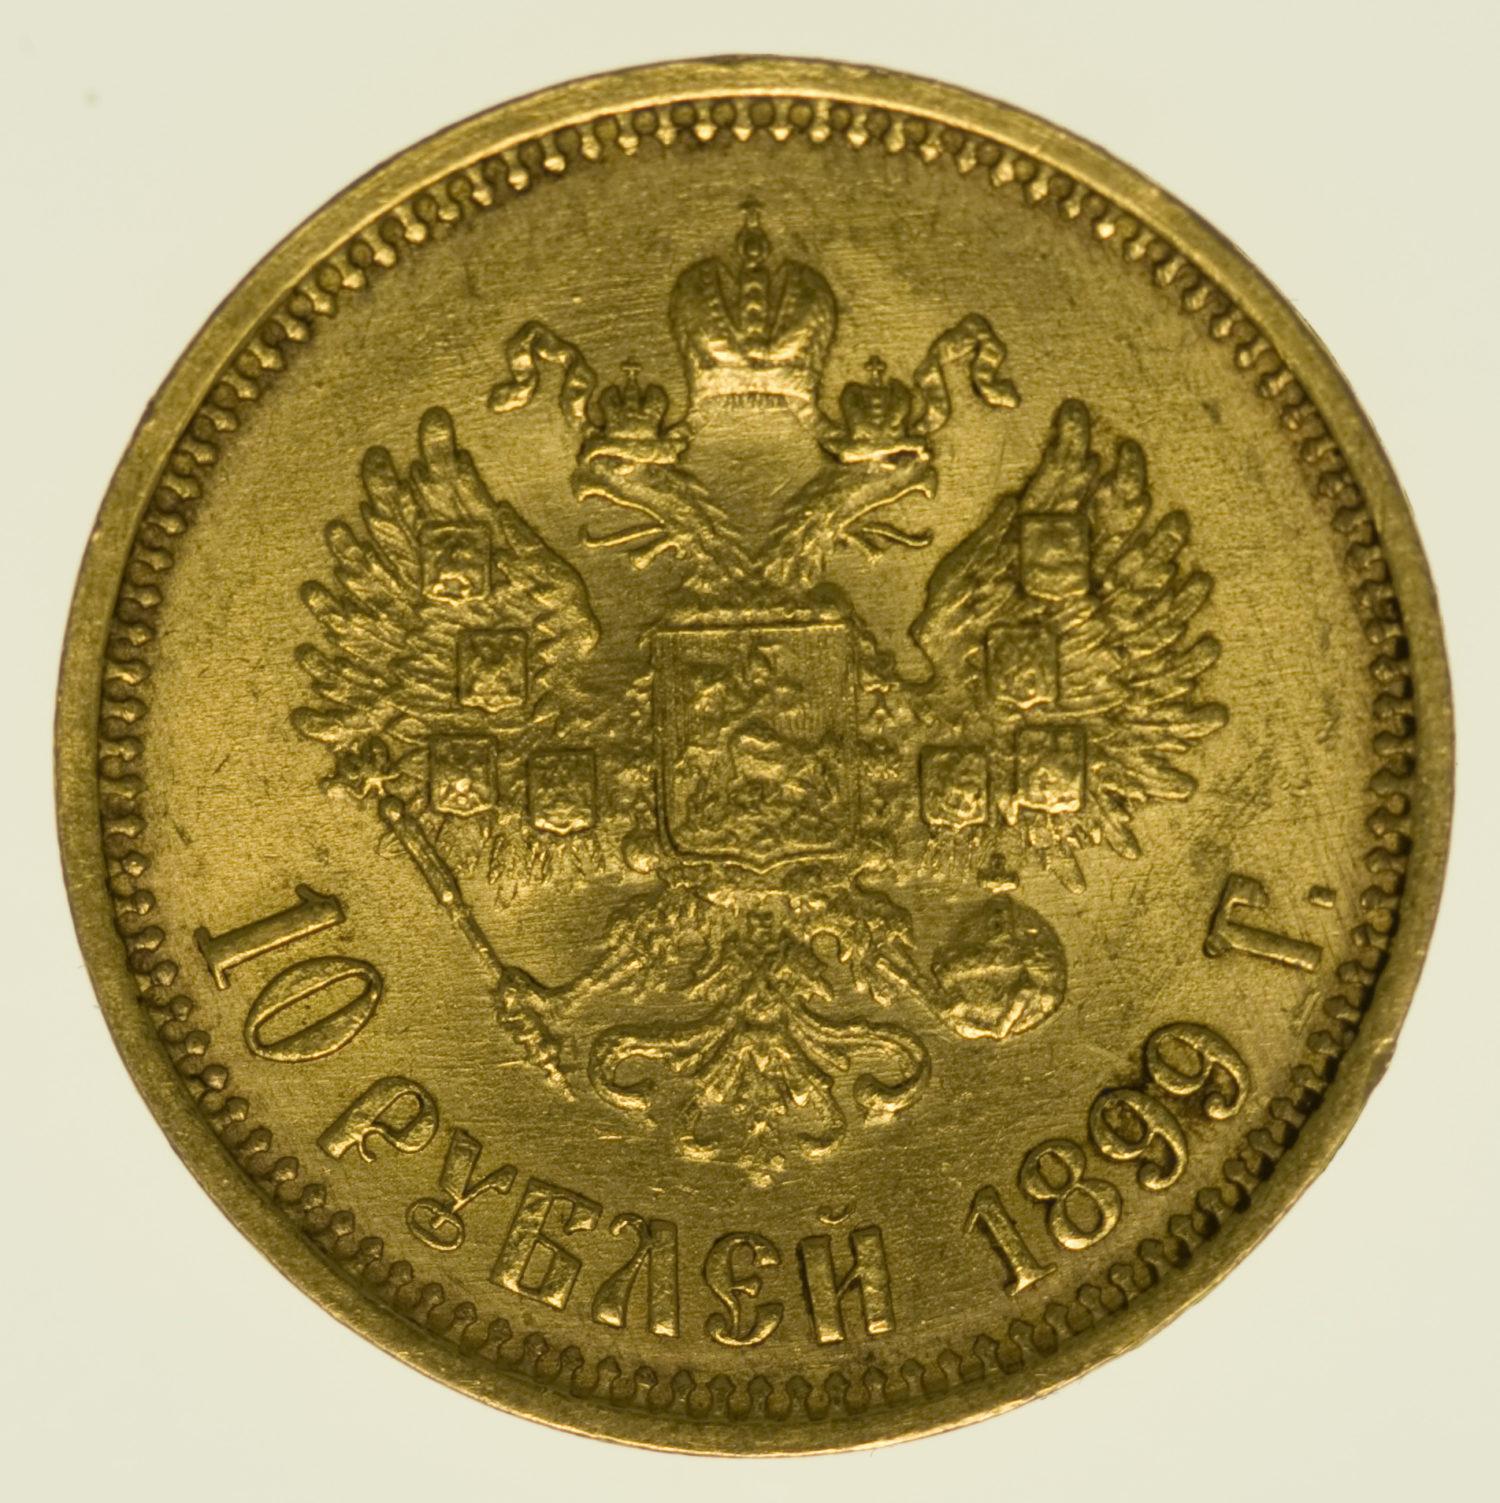 russland - Russland Nikolaus II. 10 Rubel 1899